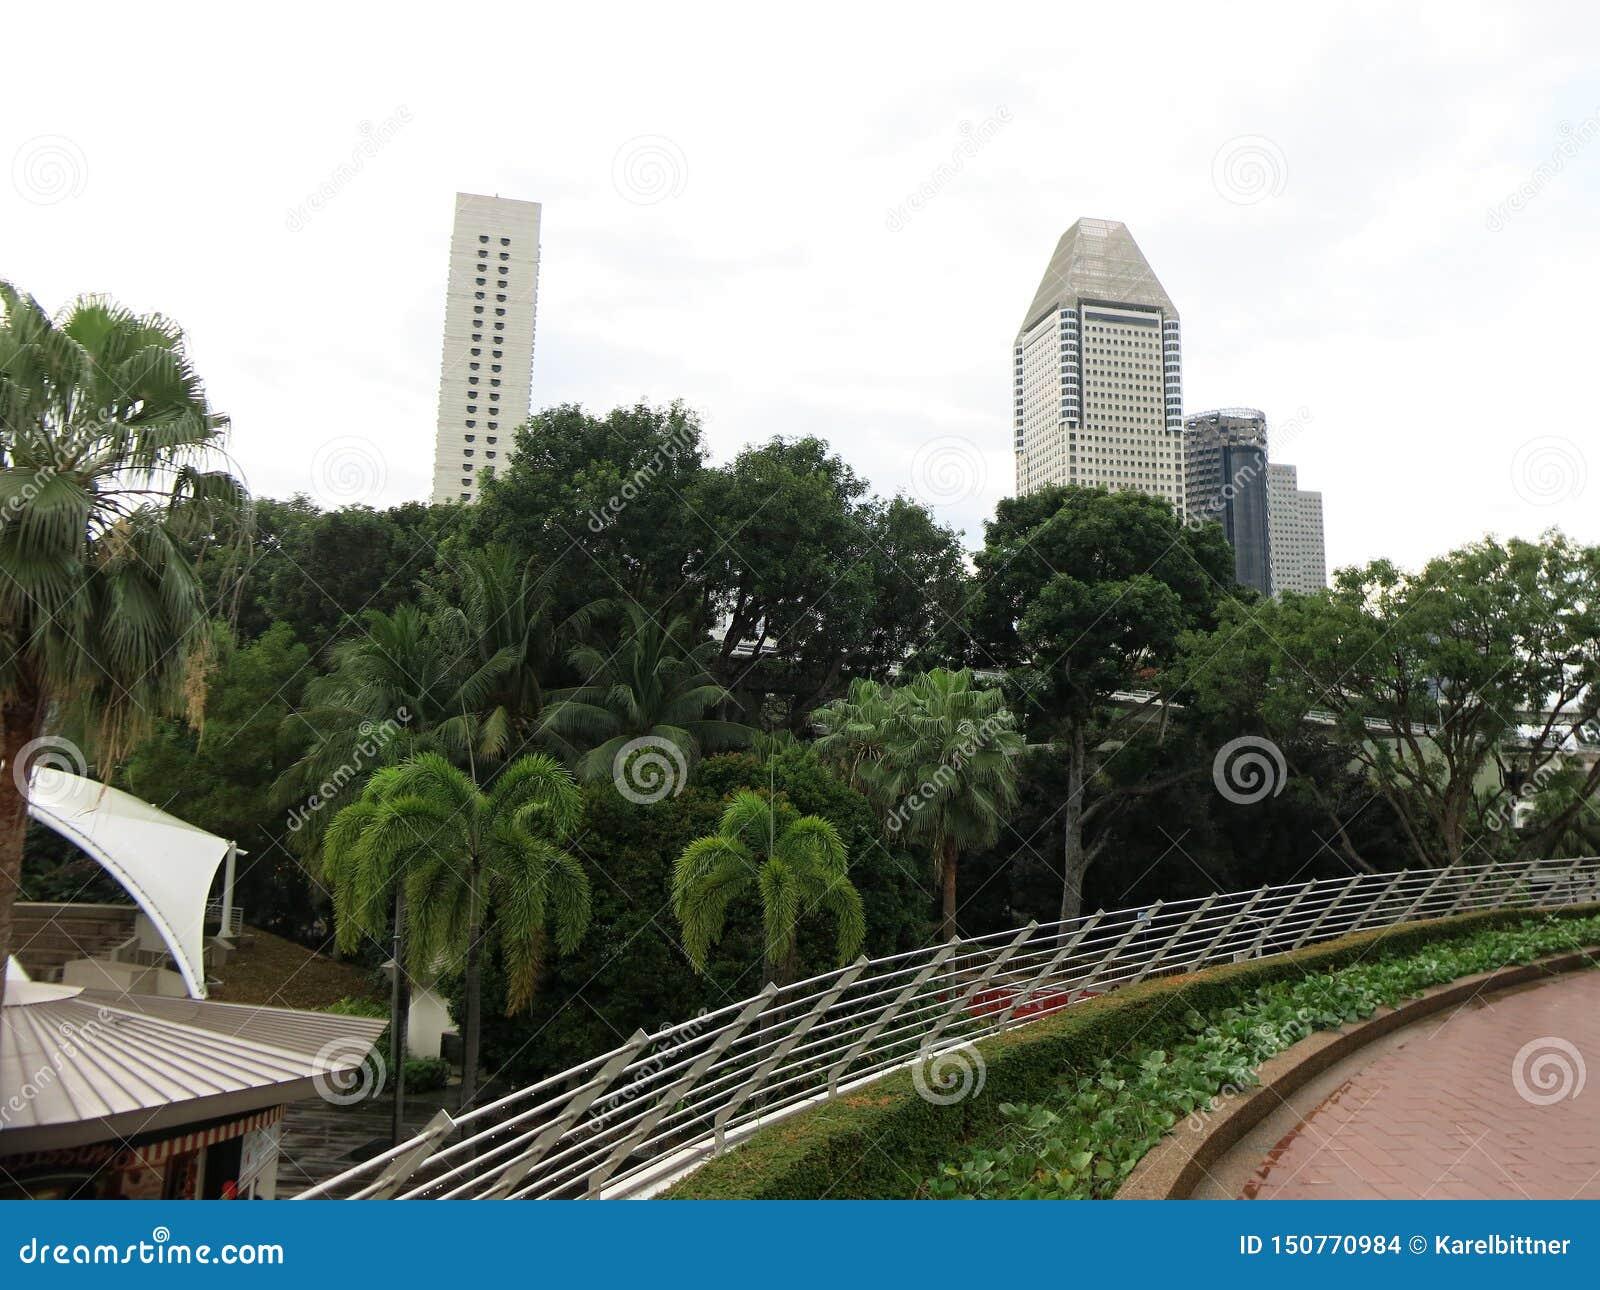 Furama city center. Modern high-rise buildings. Architecture and art in modern civilization.